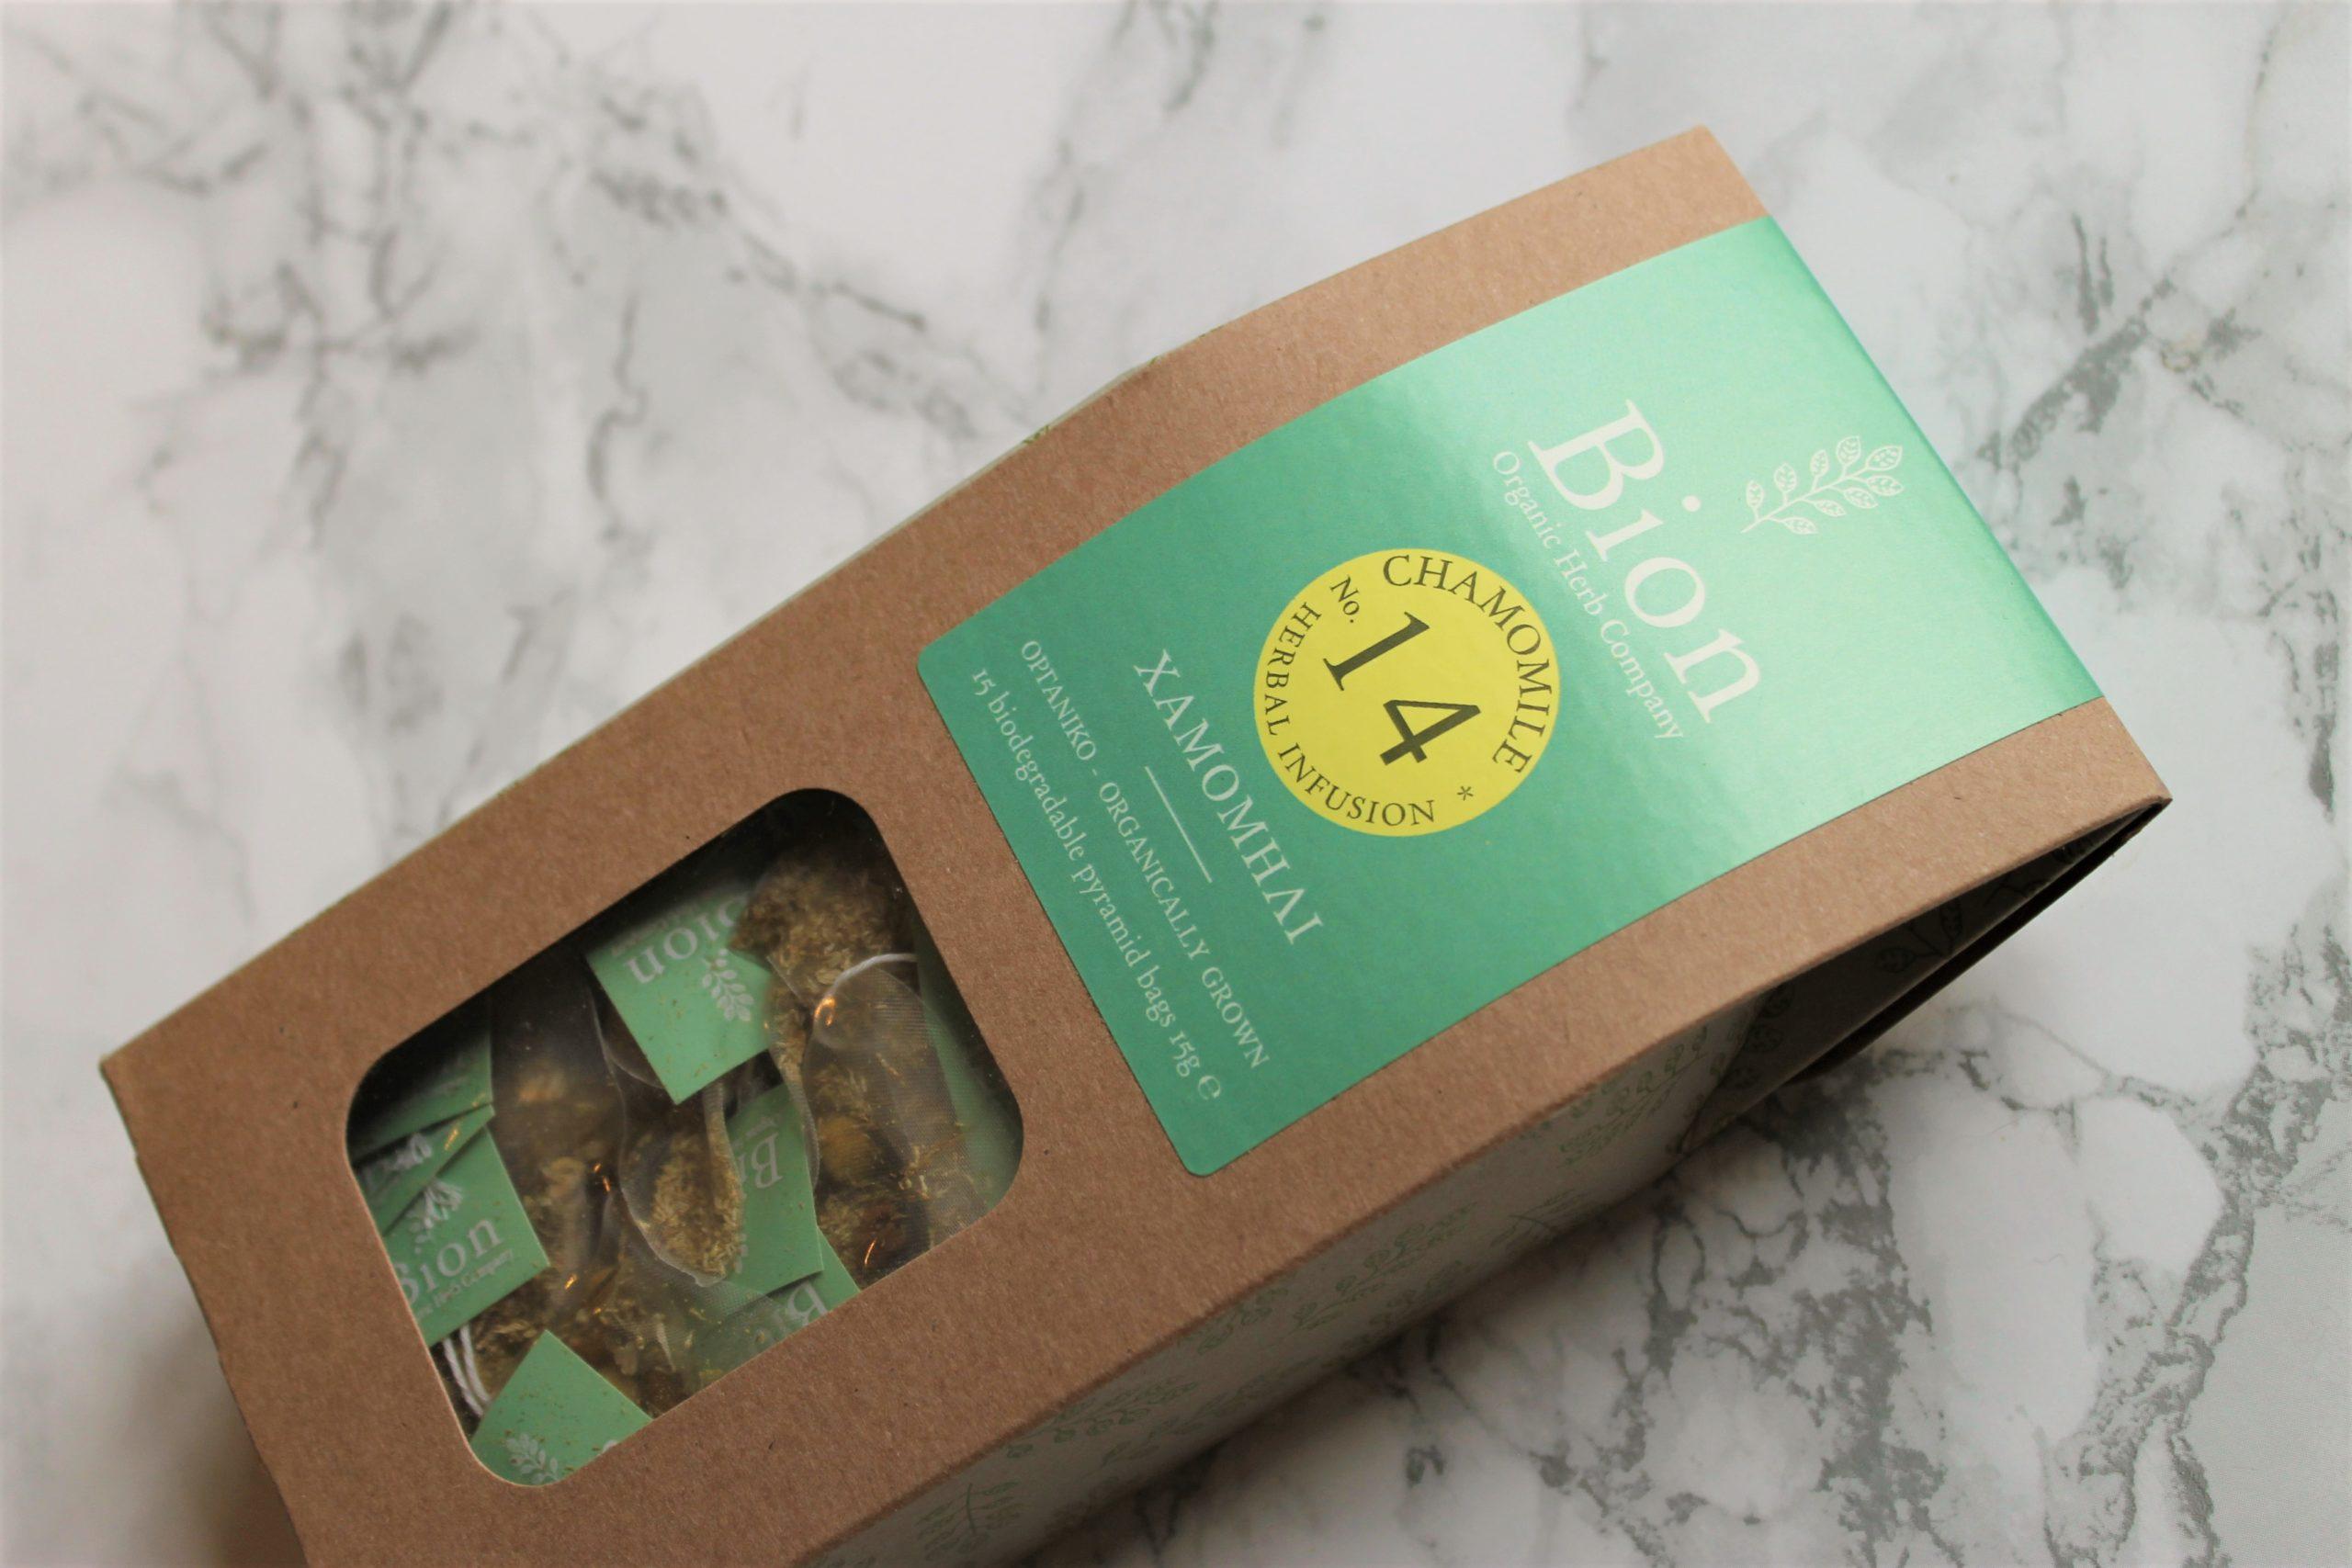 bion organic herb company chamomile